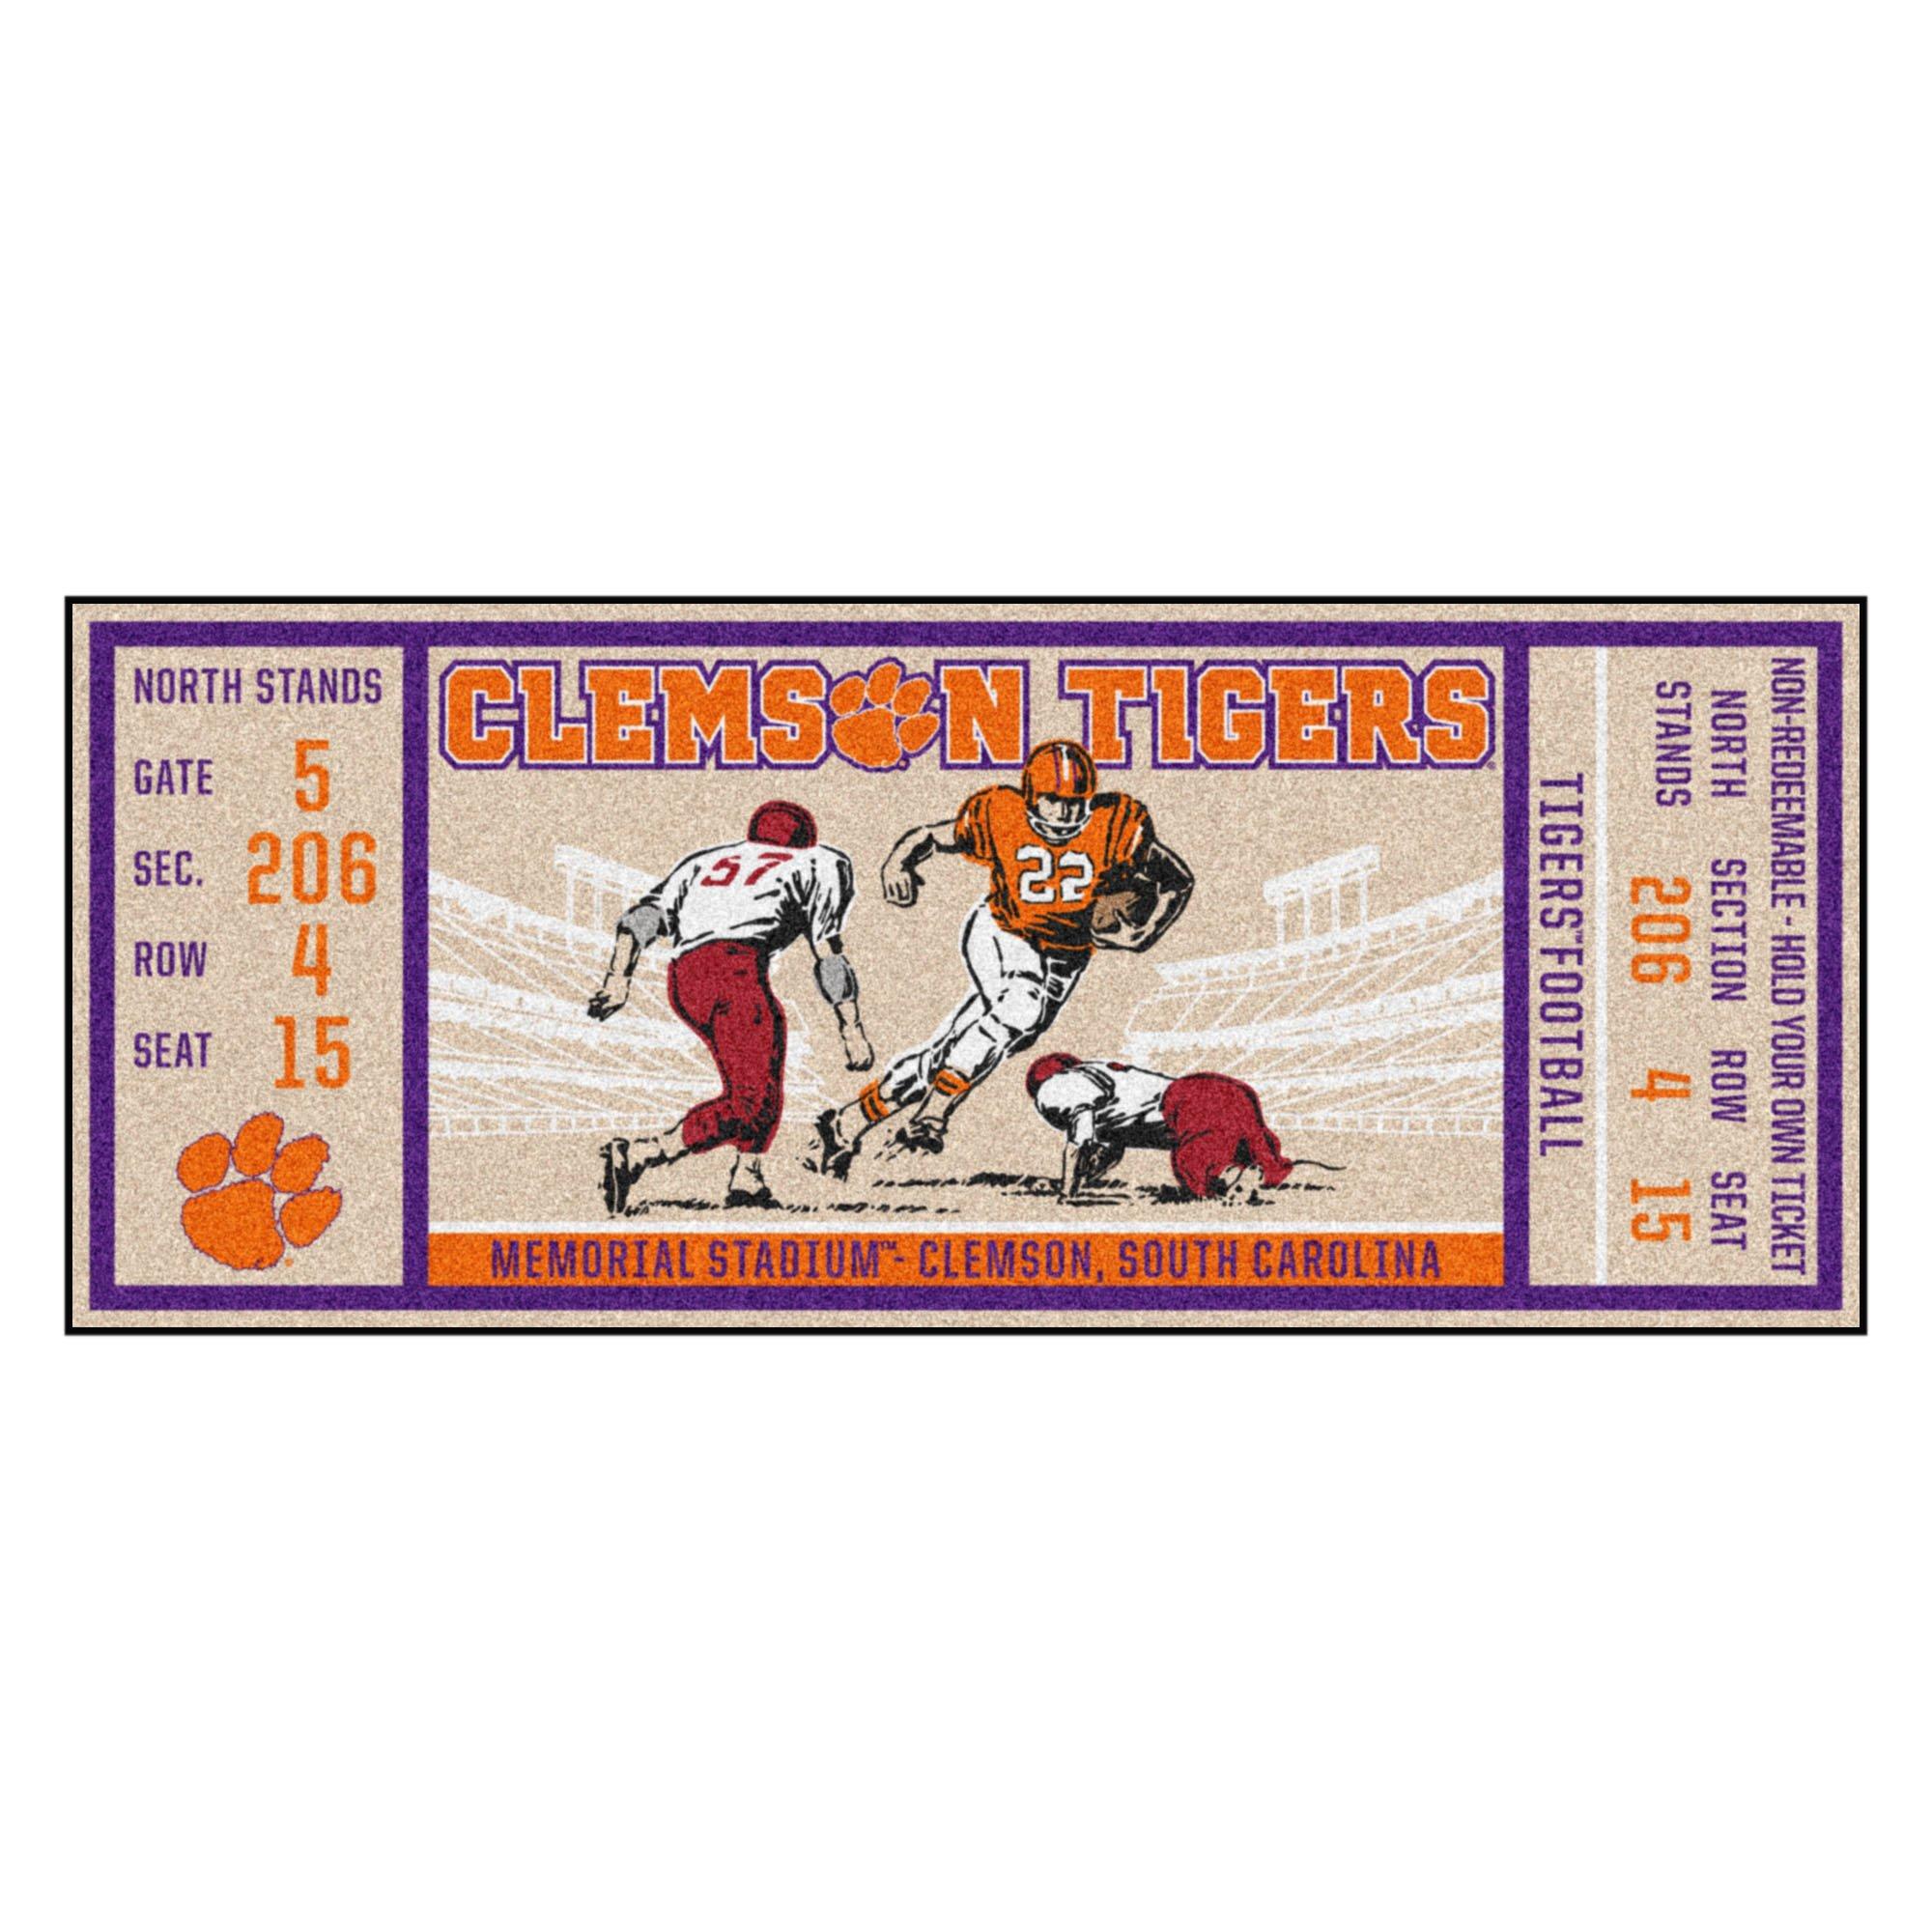 NCAA Clemson University Tigers Ticket Non-Skid Mat Area Rug Runner